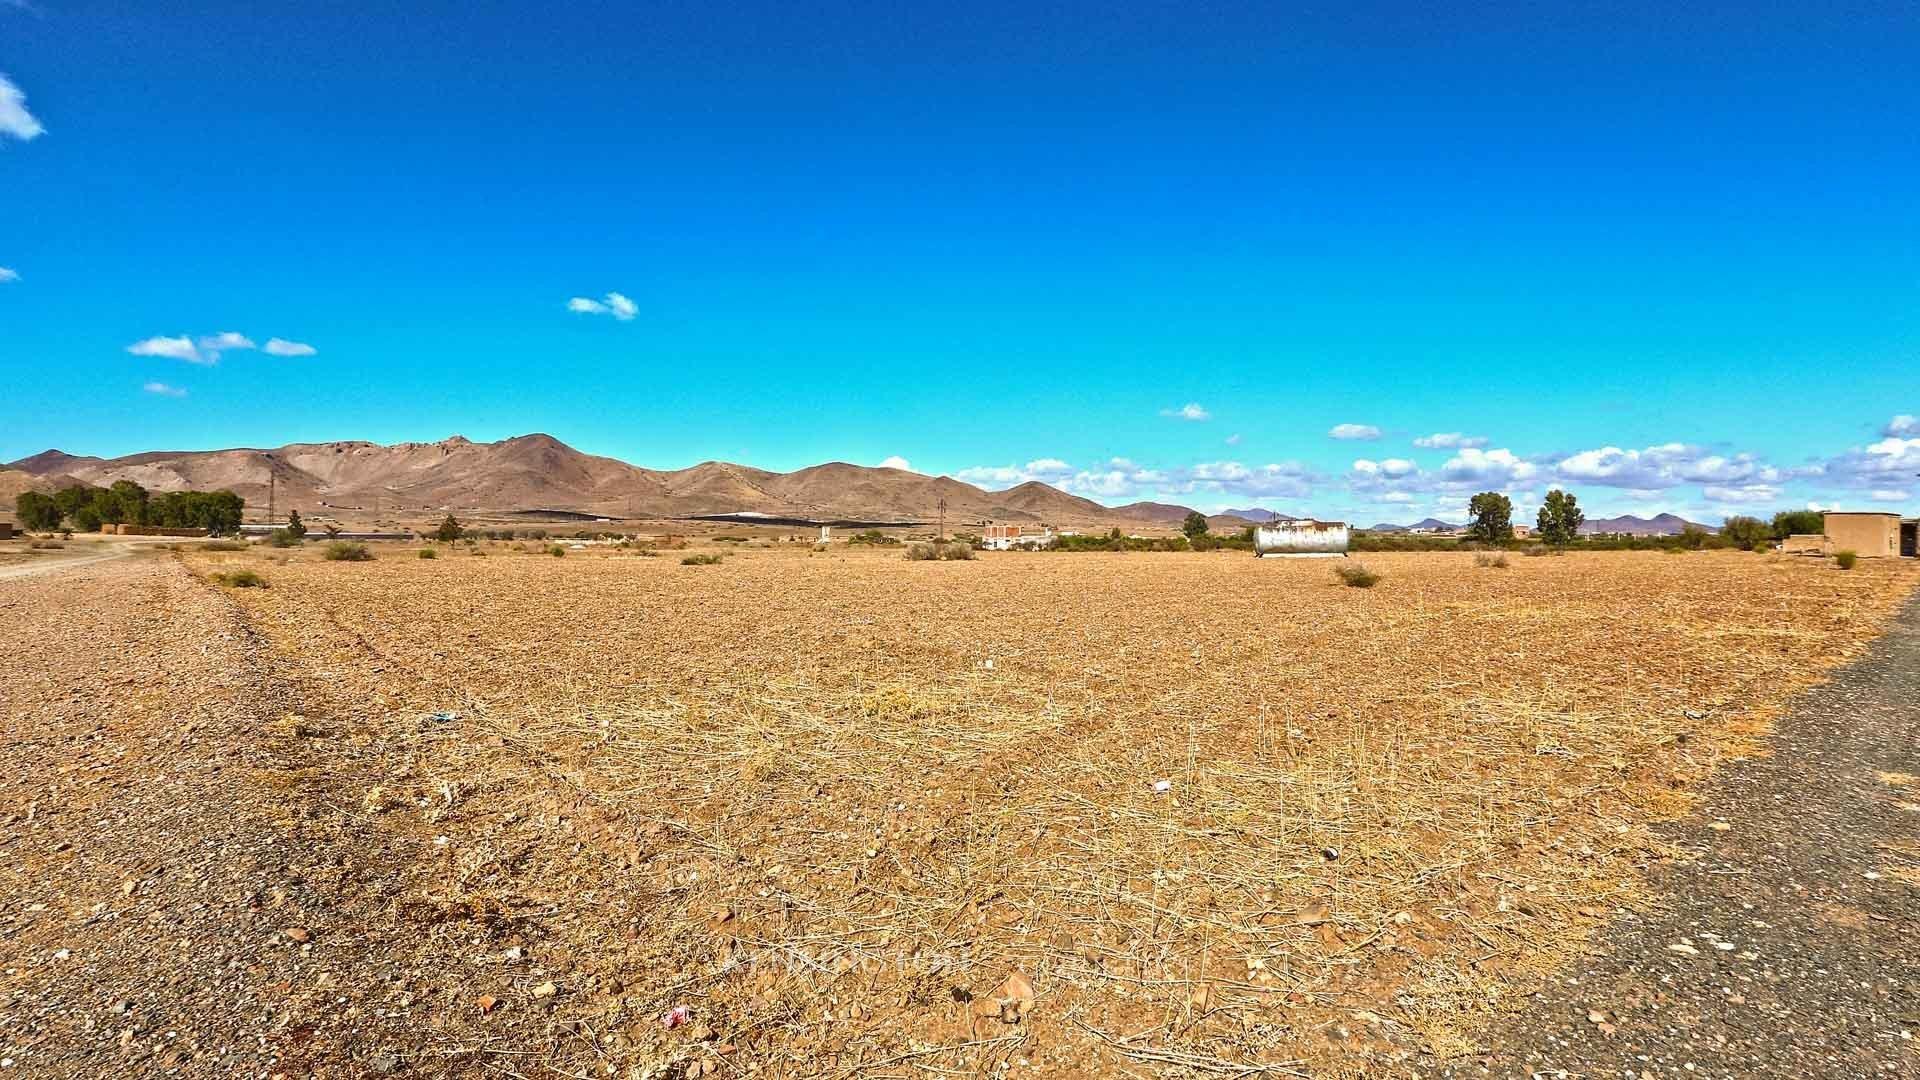 KPPM01314: Building Land Baka Building land Marrakech Morocco